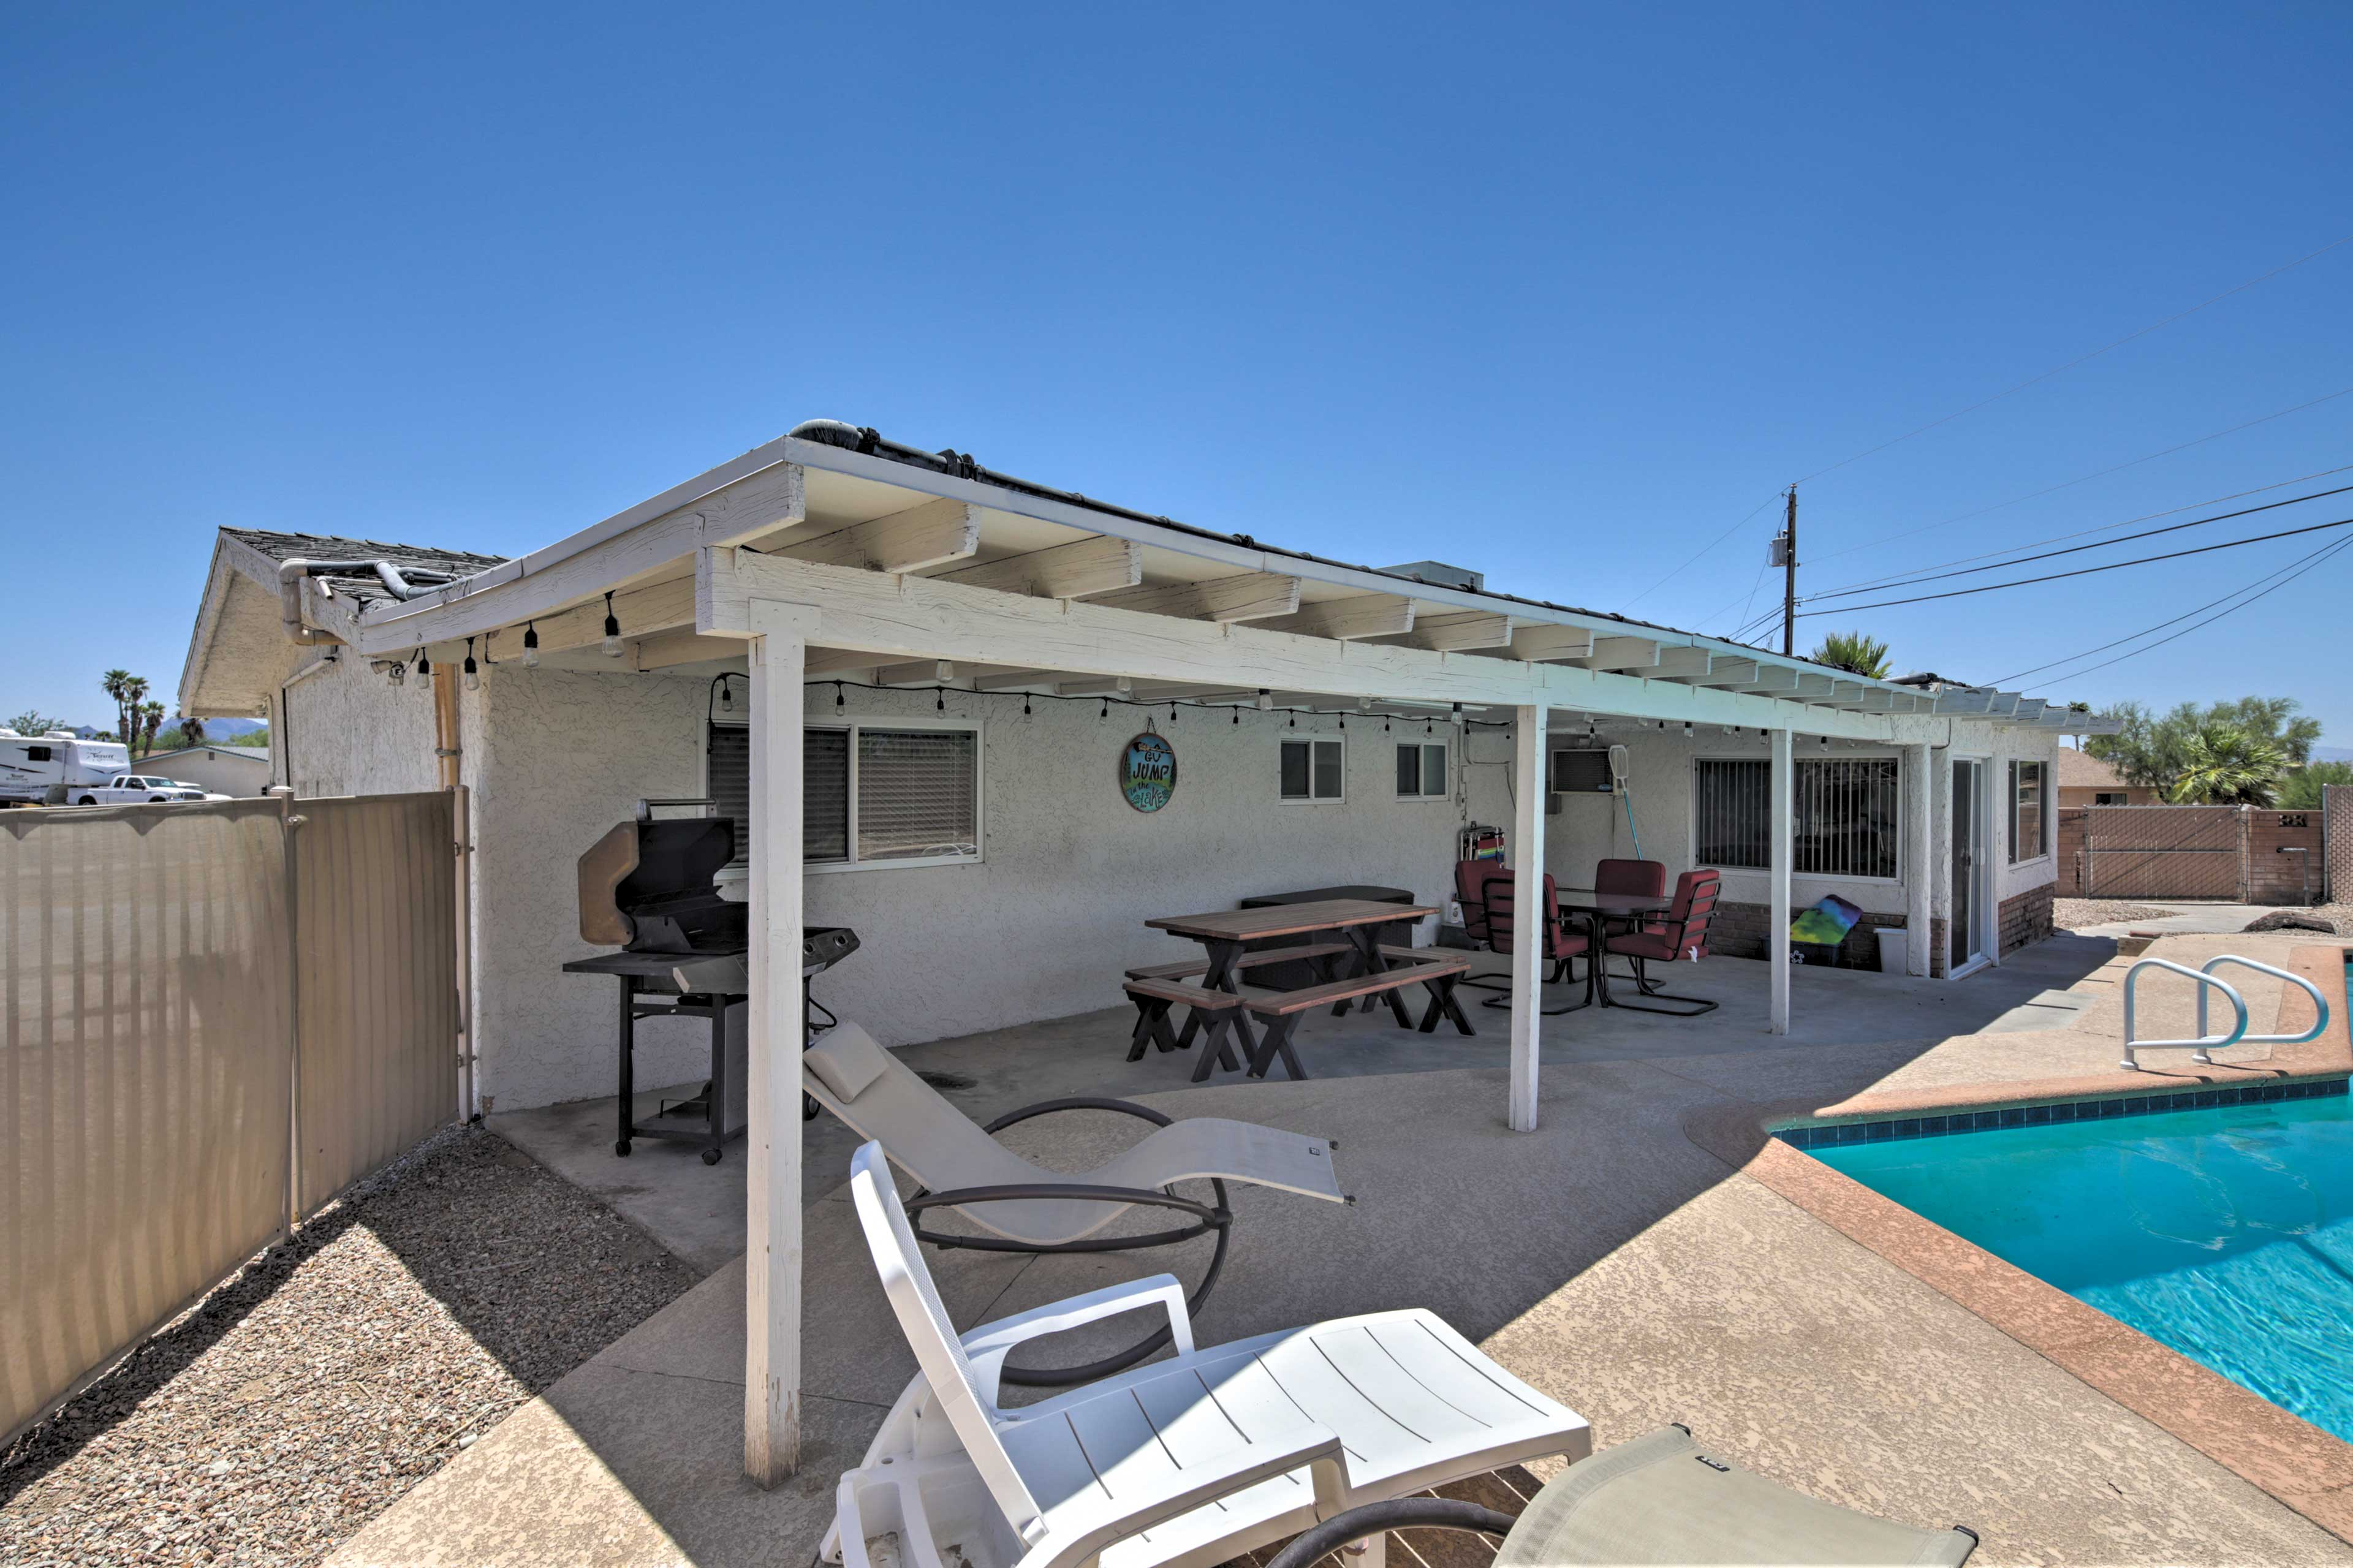 Bask in the Arizona sunshine on your pool deck.